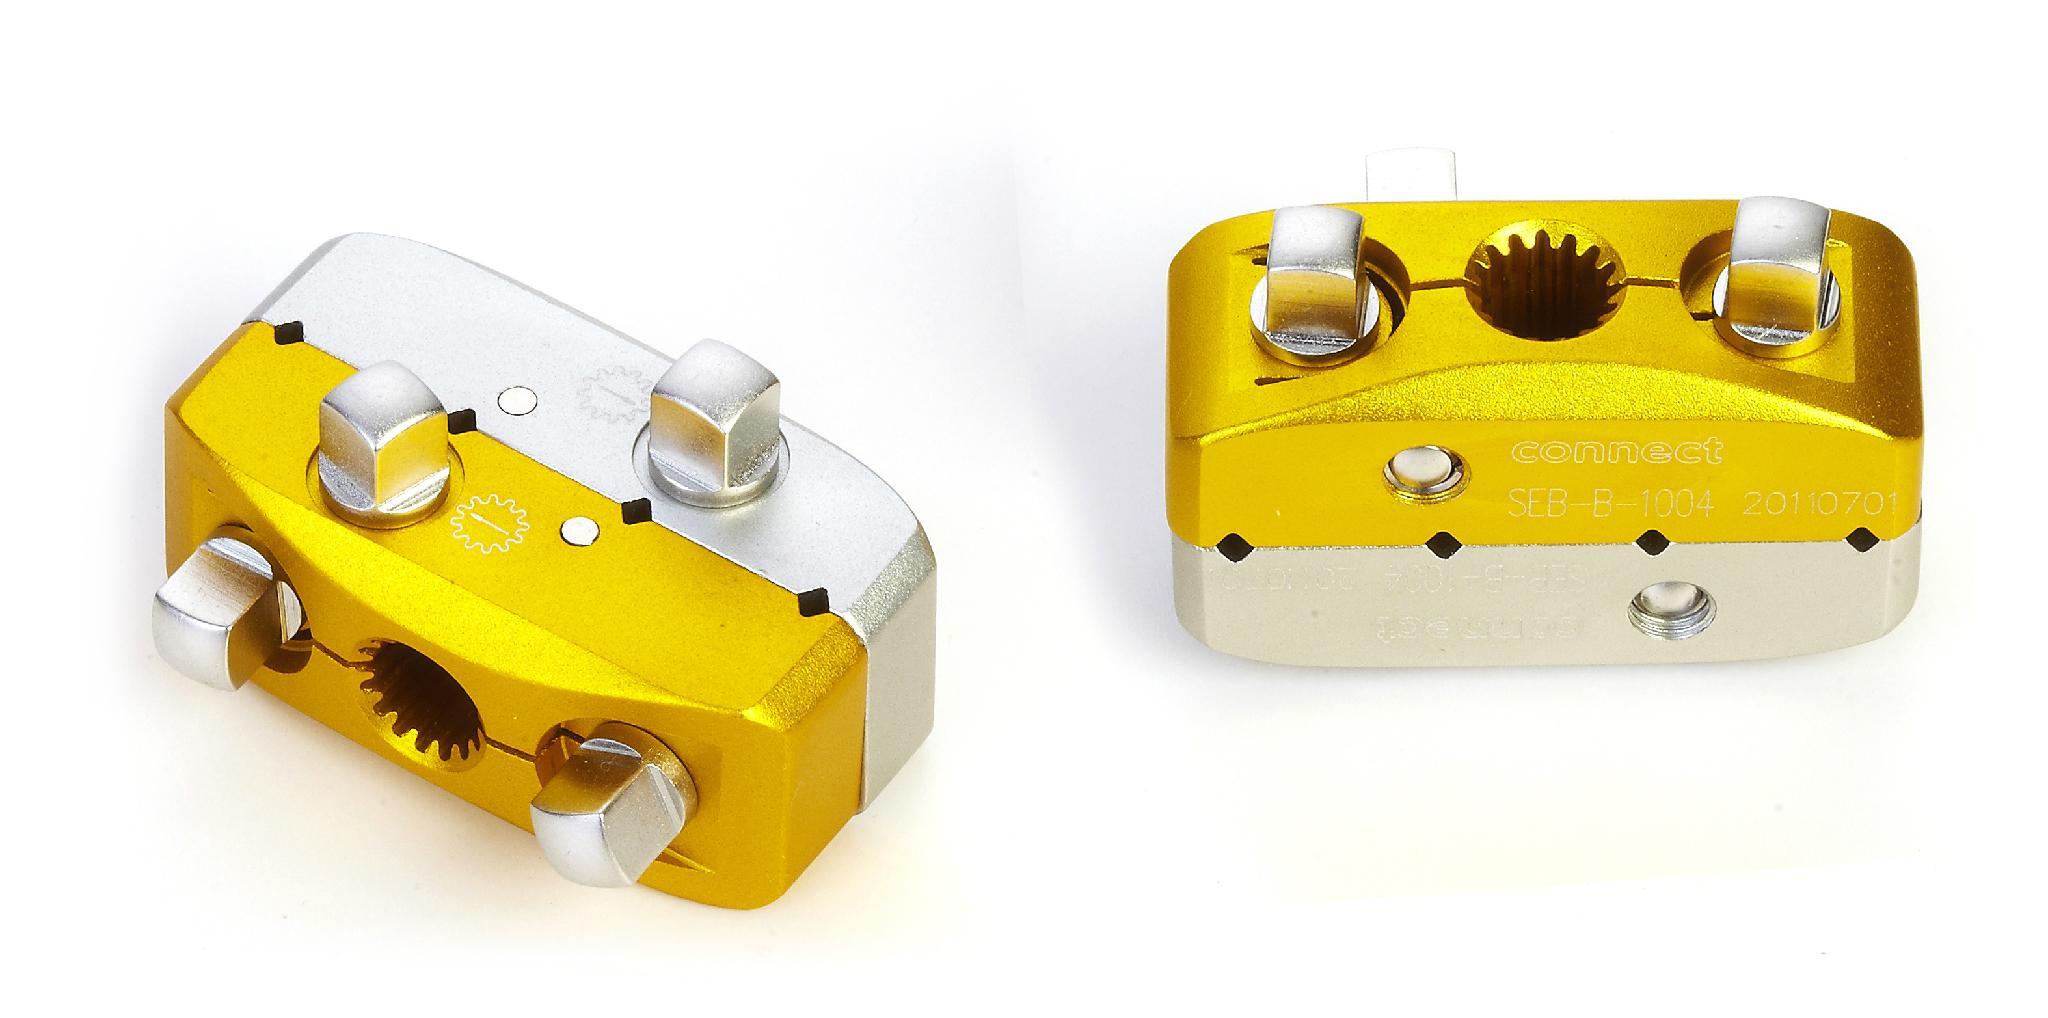 SK Combined External Fixator(Small Bone) 10